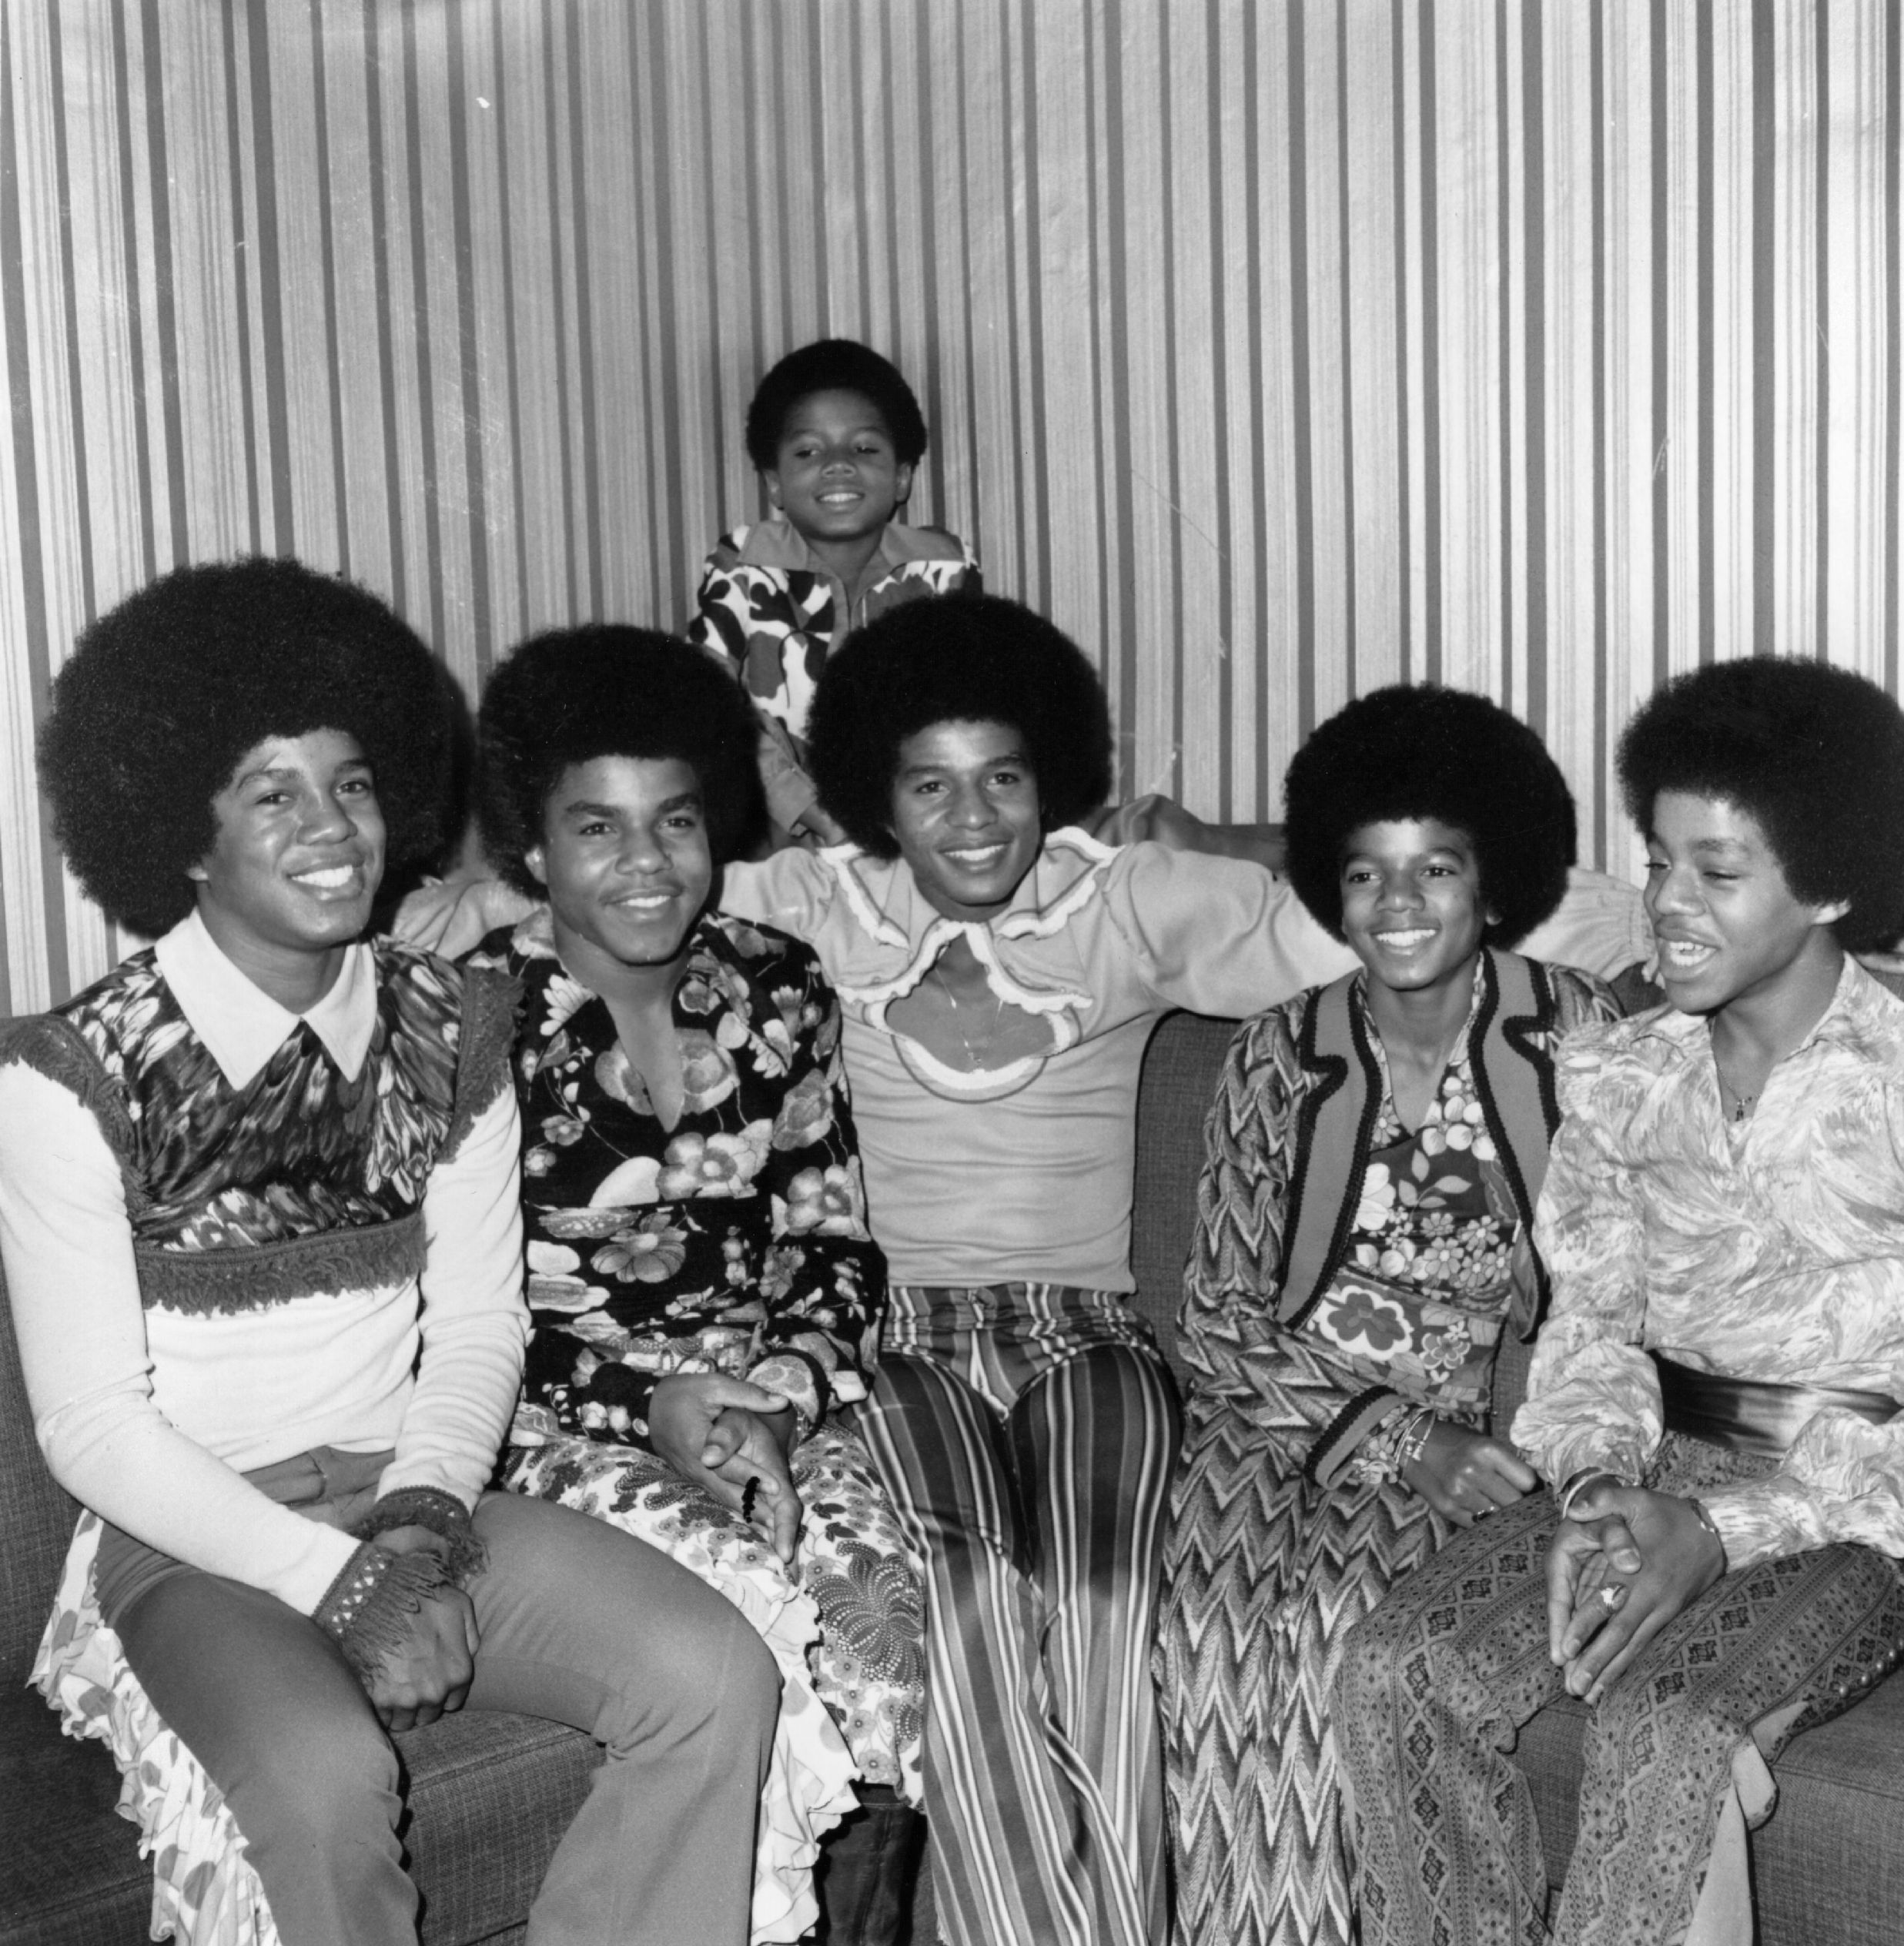 Donald Bohana, Don Bohana Dee Dee Jackson, Dee Dee Jackson KIller Drowning Murder, Tito Jackson Donald Bohana, Delores Jackson Boyfriend Death